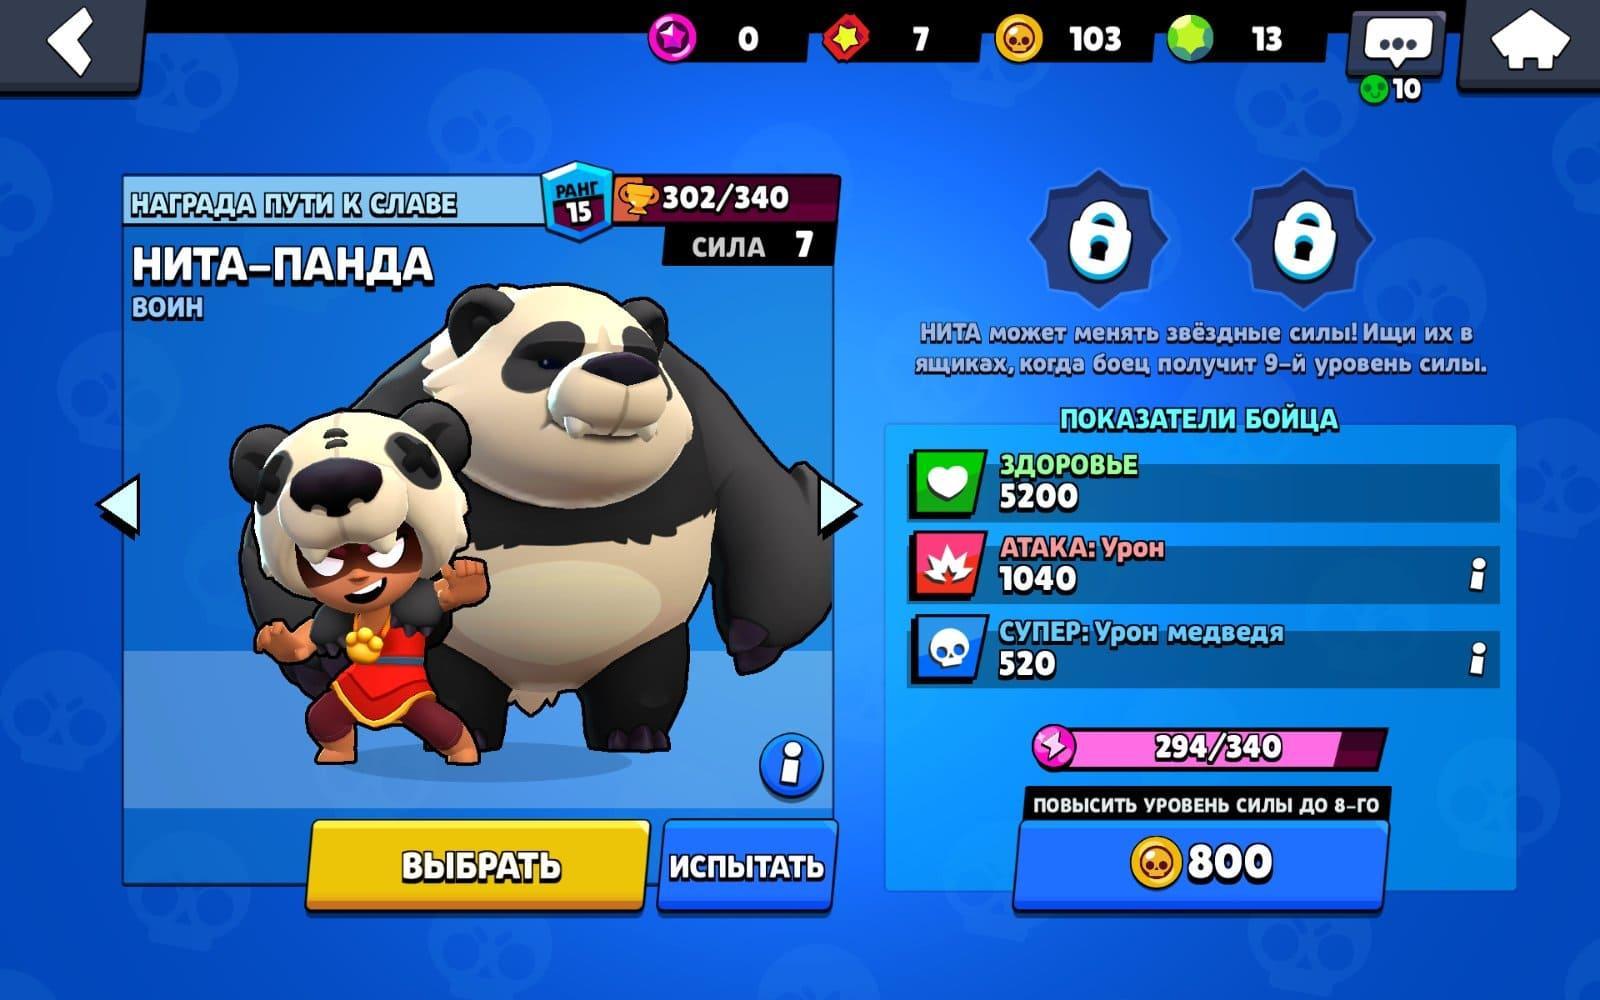 Нита-Воин Панда